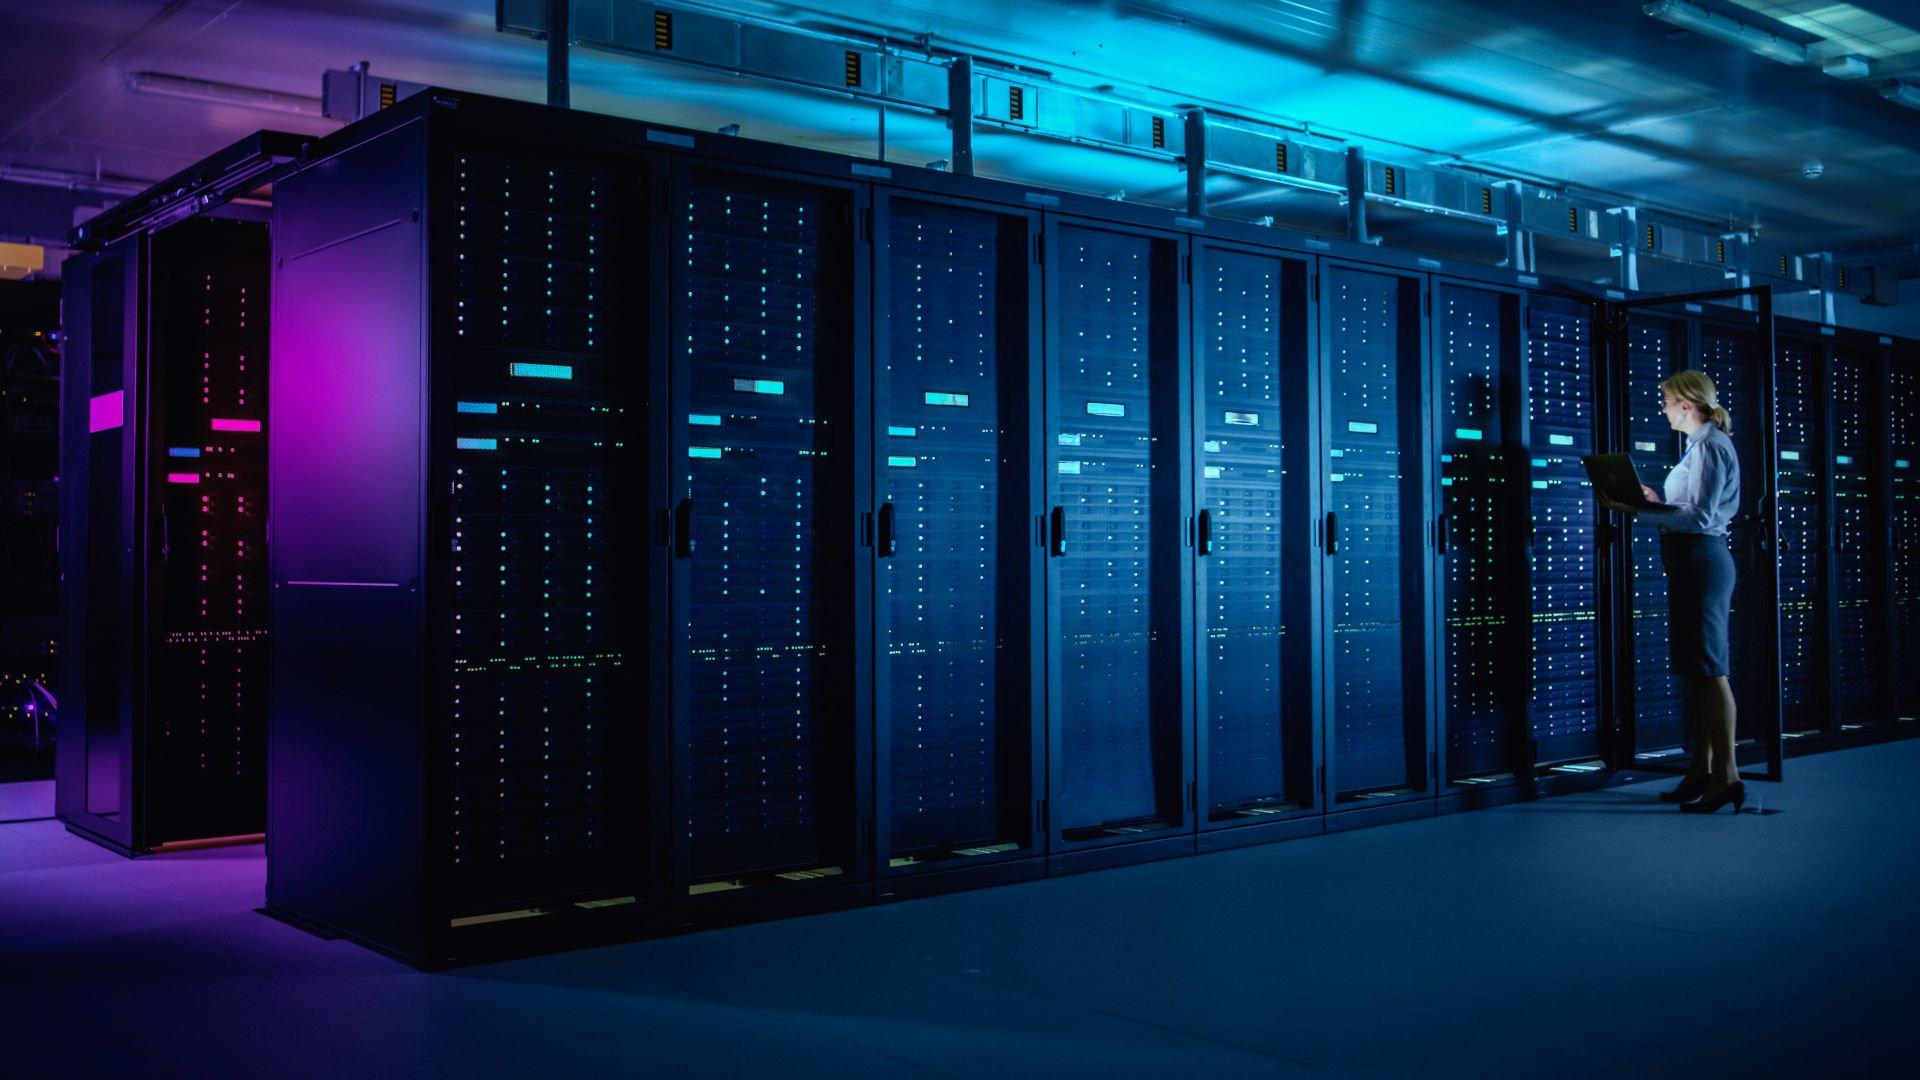 webscale-datacenter-woman-laptop